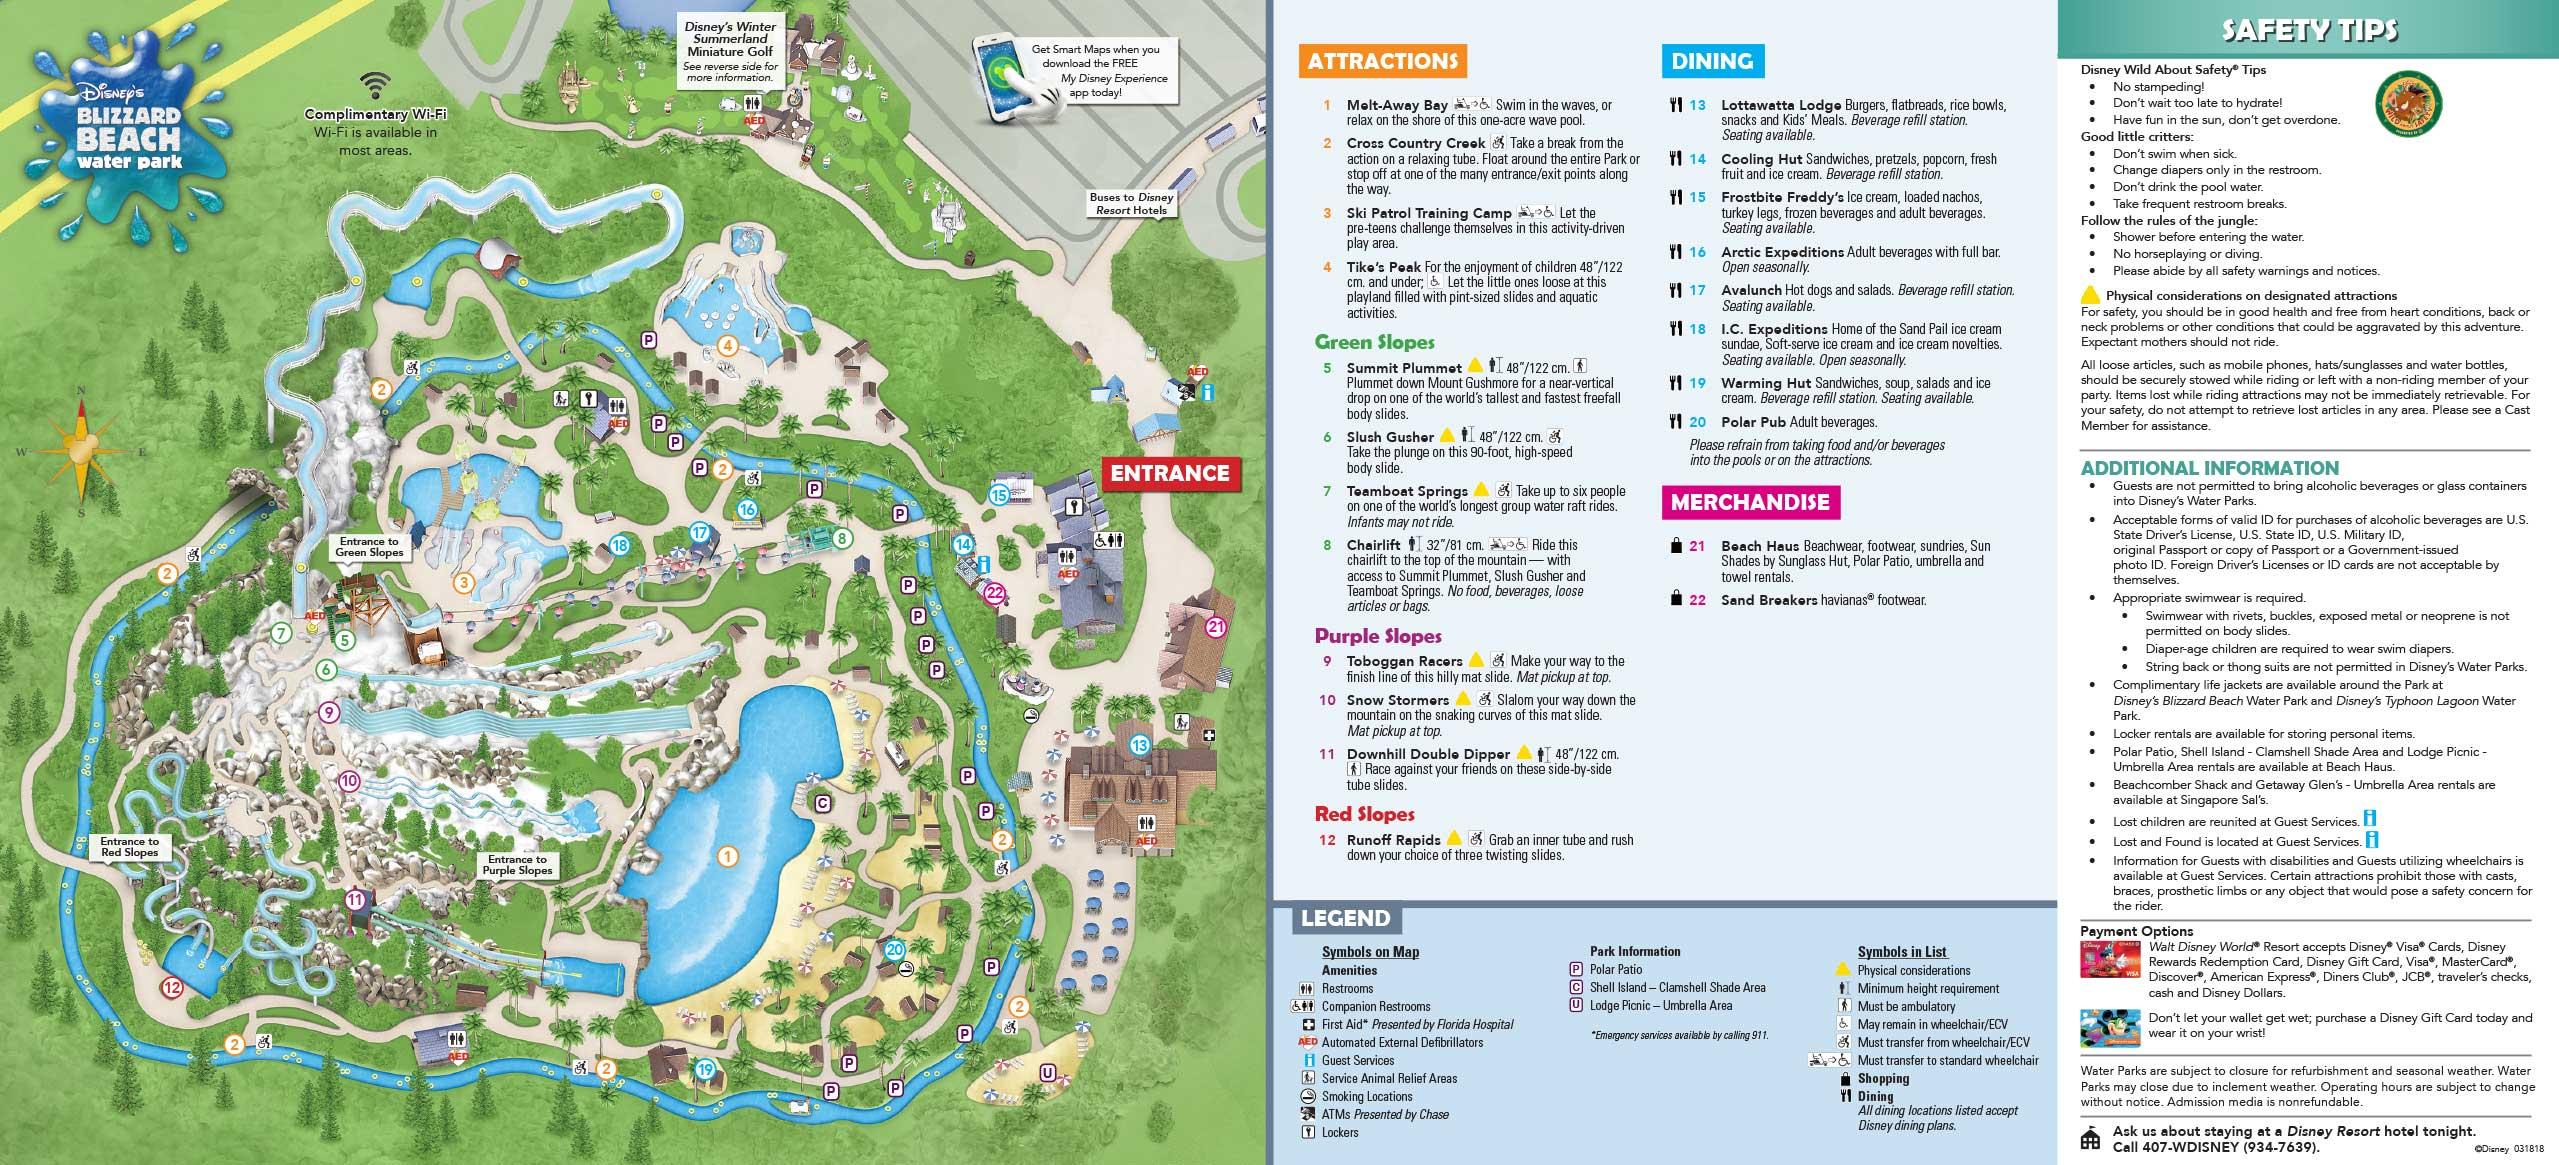 January 2019 Walt Disney World Park Maps - Photo 10 of 14